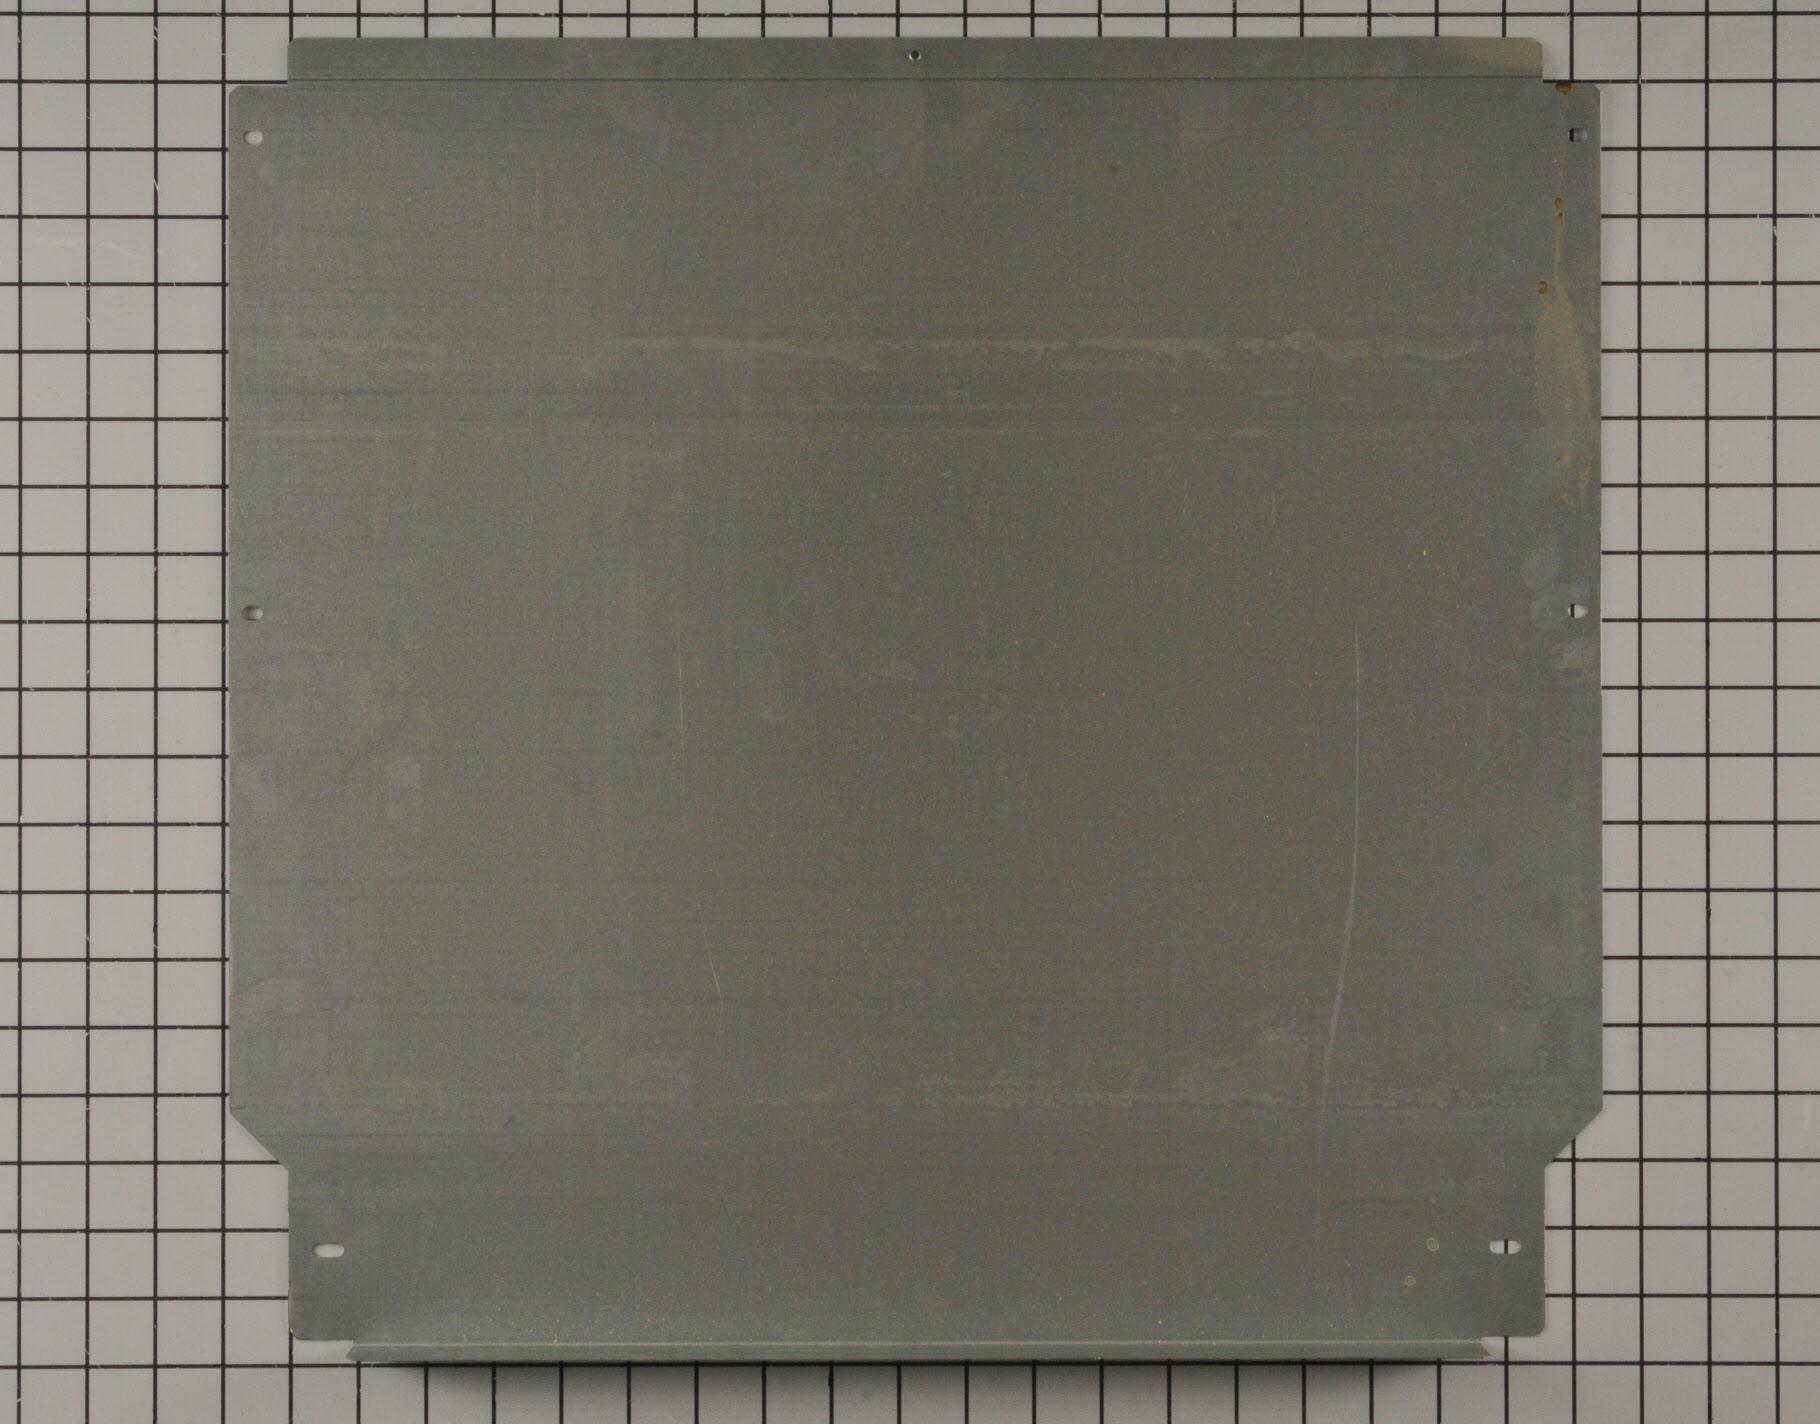 Whirlpool Range/Stove/Oven Part # 3604F416-51 - Heat Shield